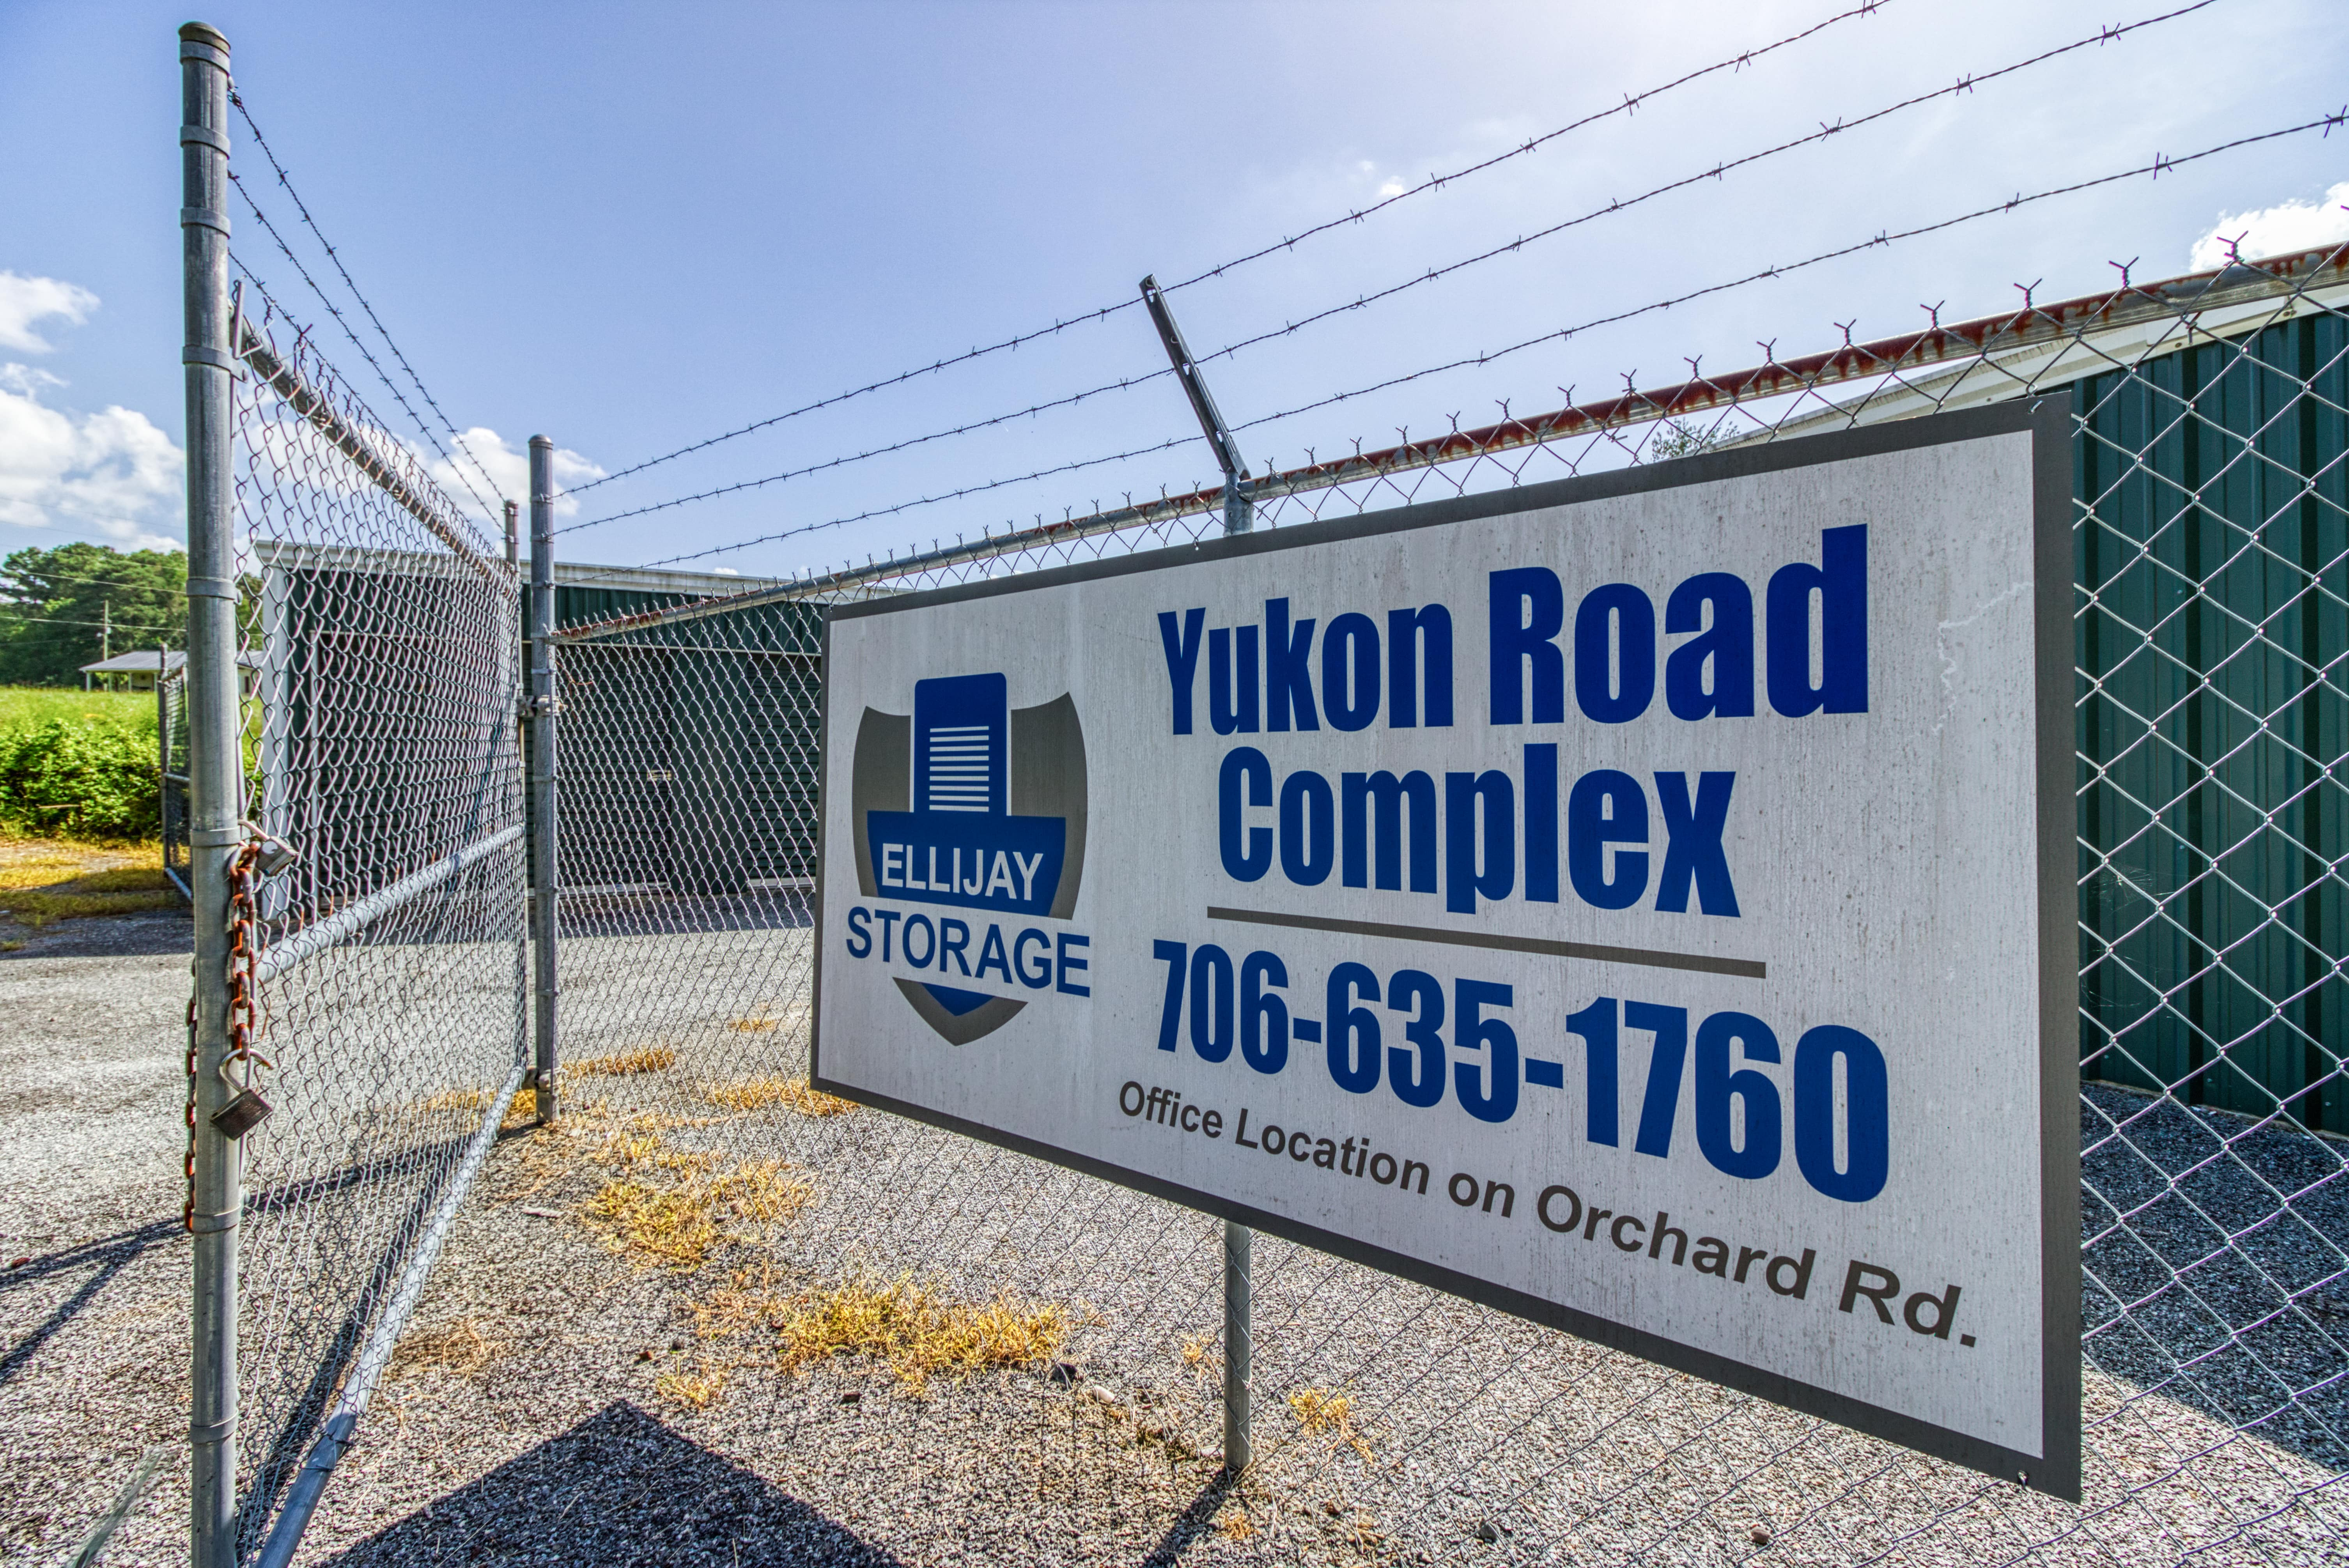 Ellijay Storage on Yukon Road